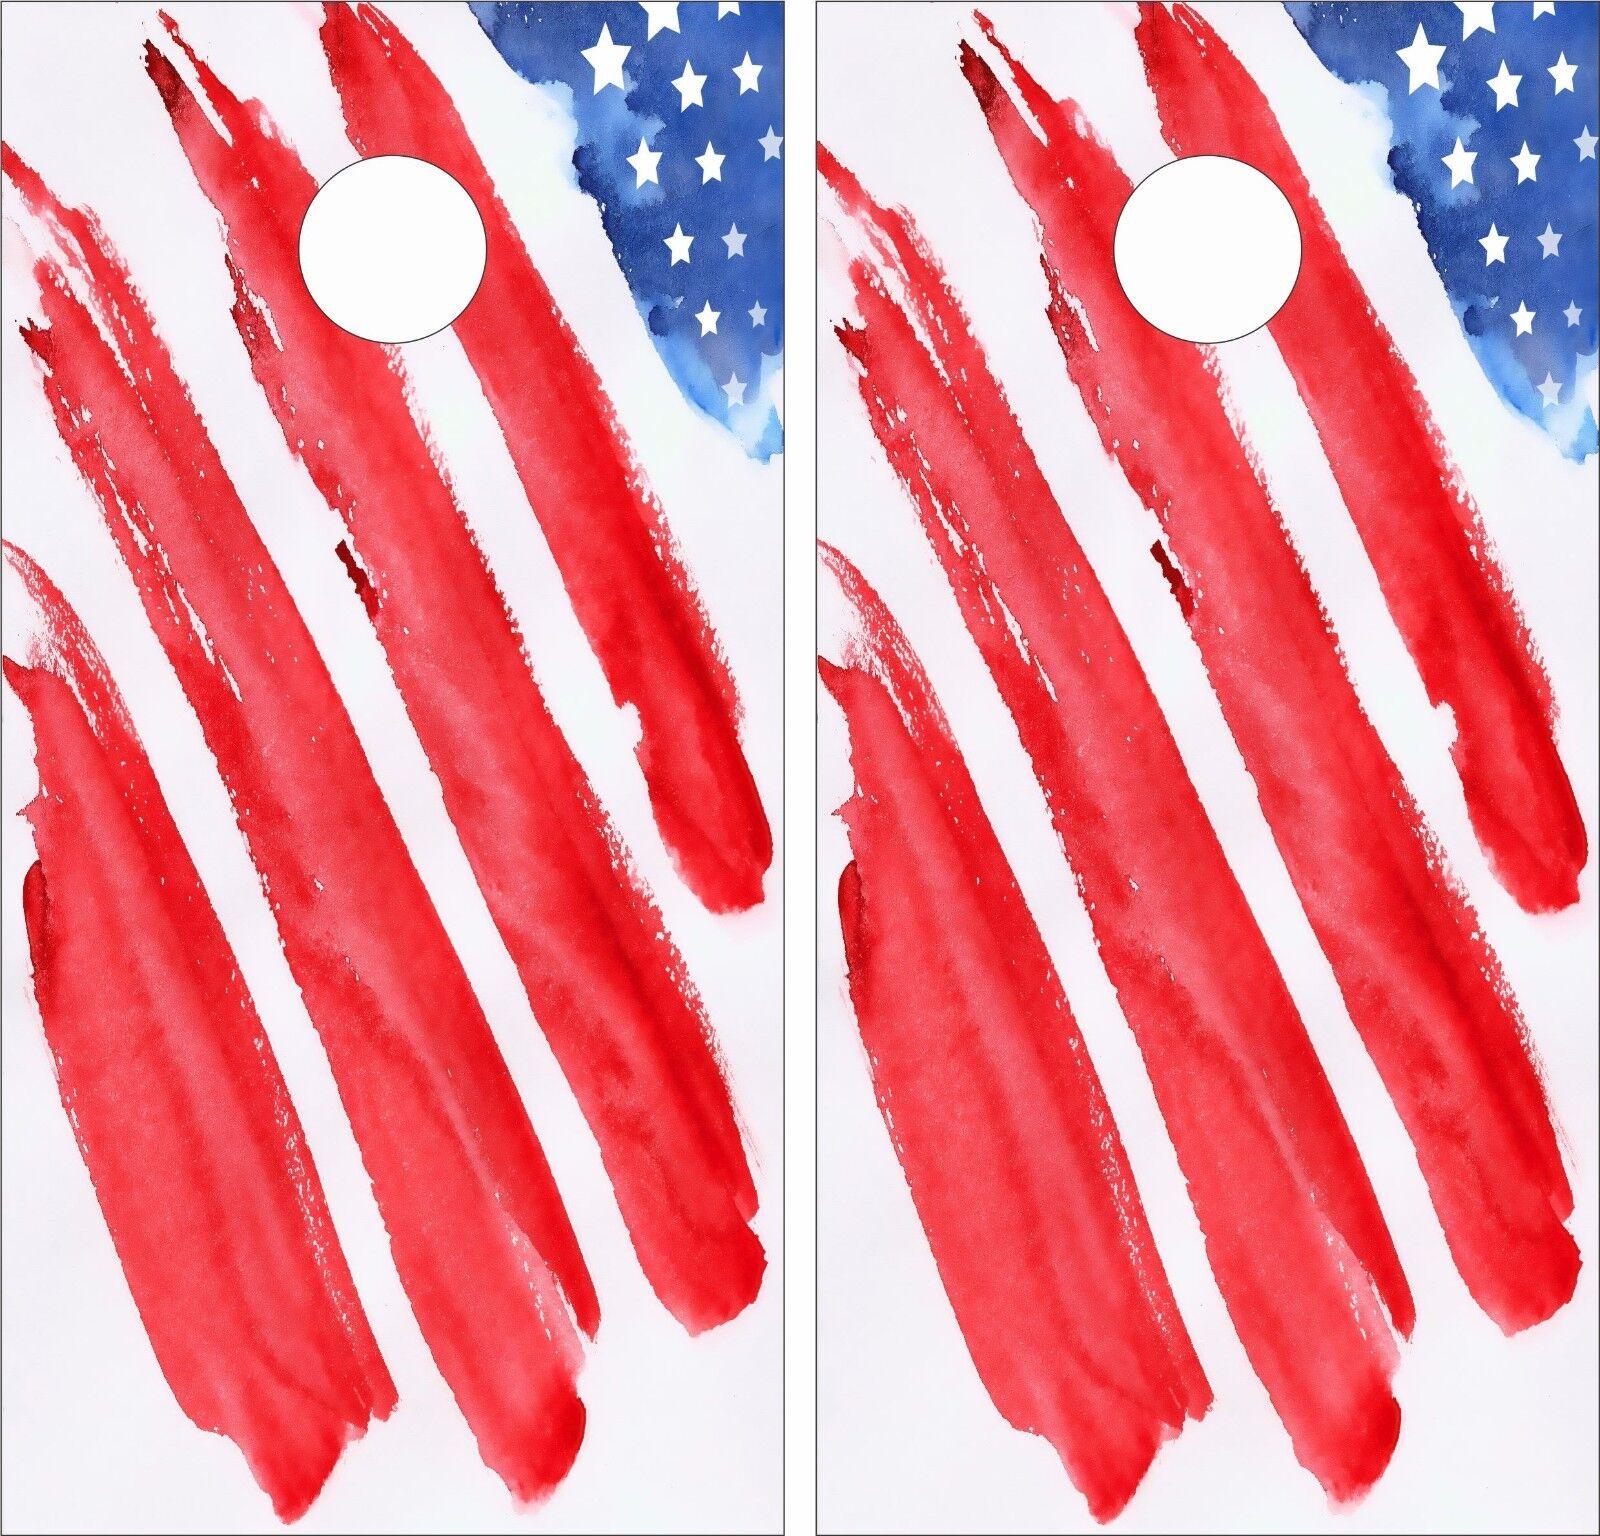 American Flag Paint .Cornhole Board Game Decal Wraps USA High Quality Image bag